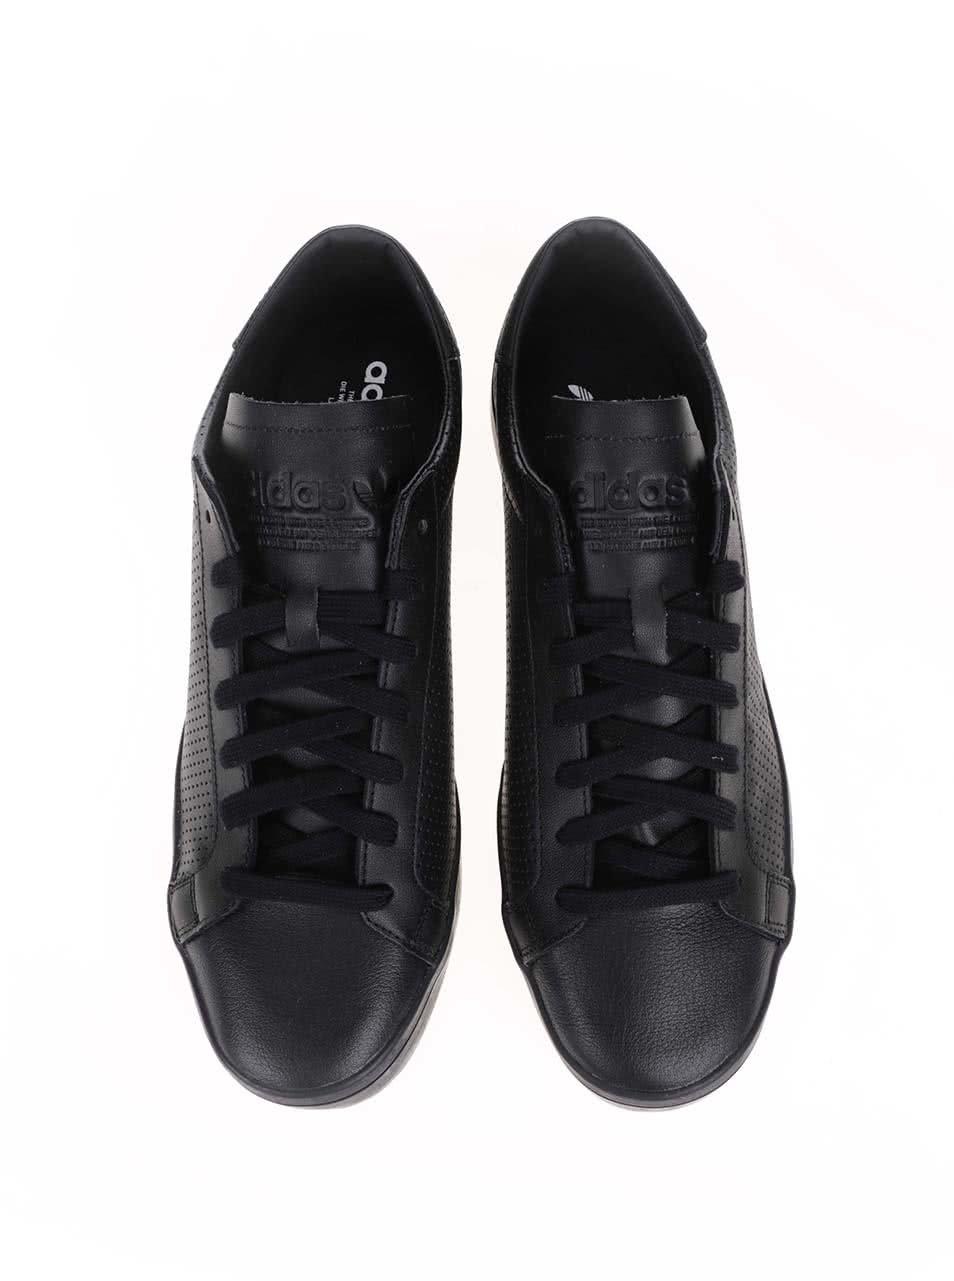 118ef6e11 Černé pánské kožené tenisky adidas Originals Court Vantage | ZOOT.cz